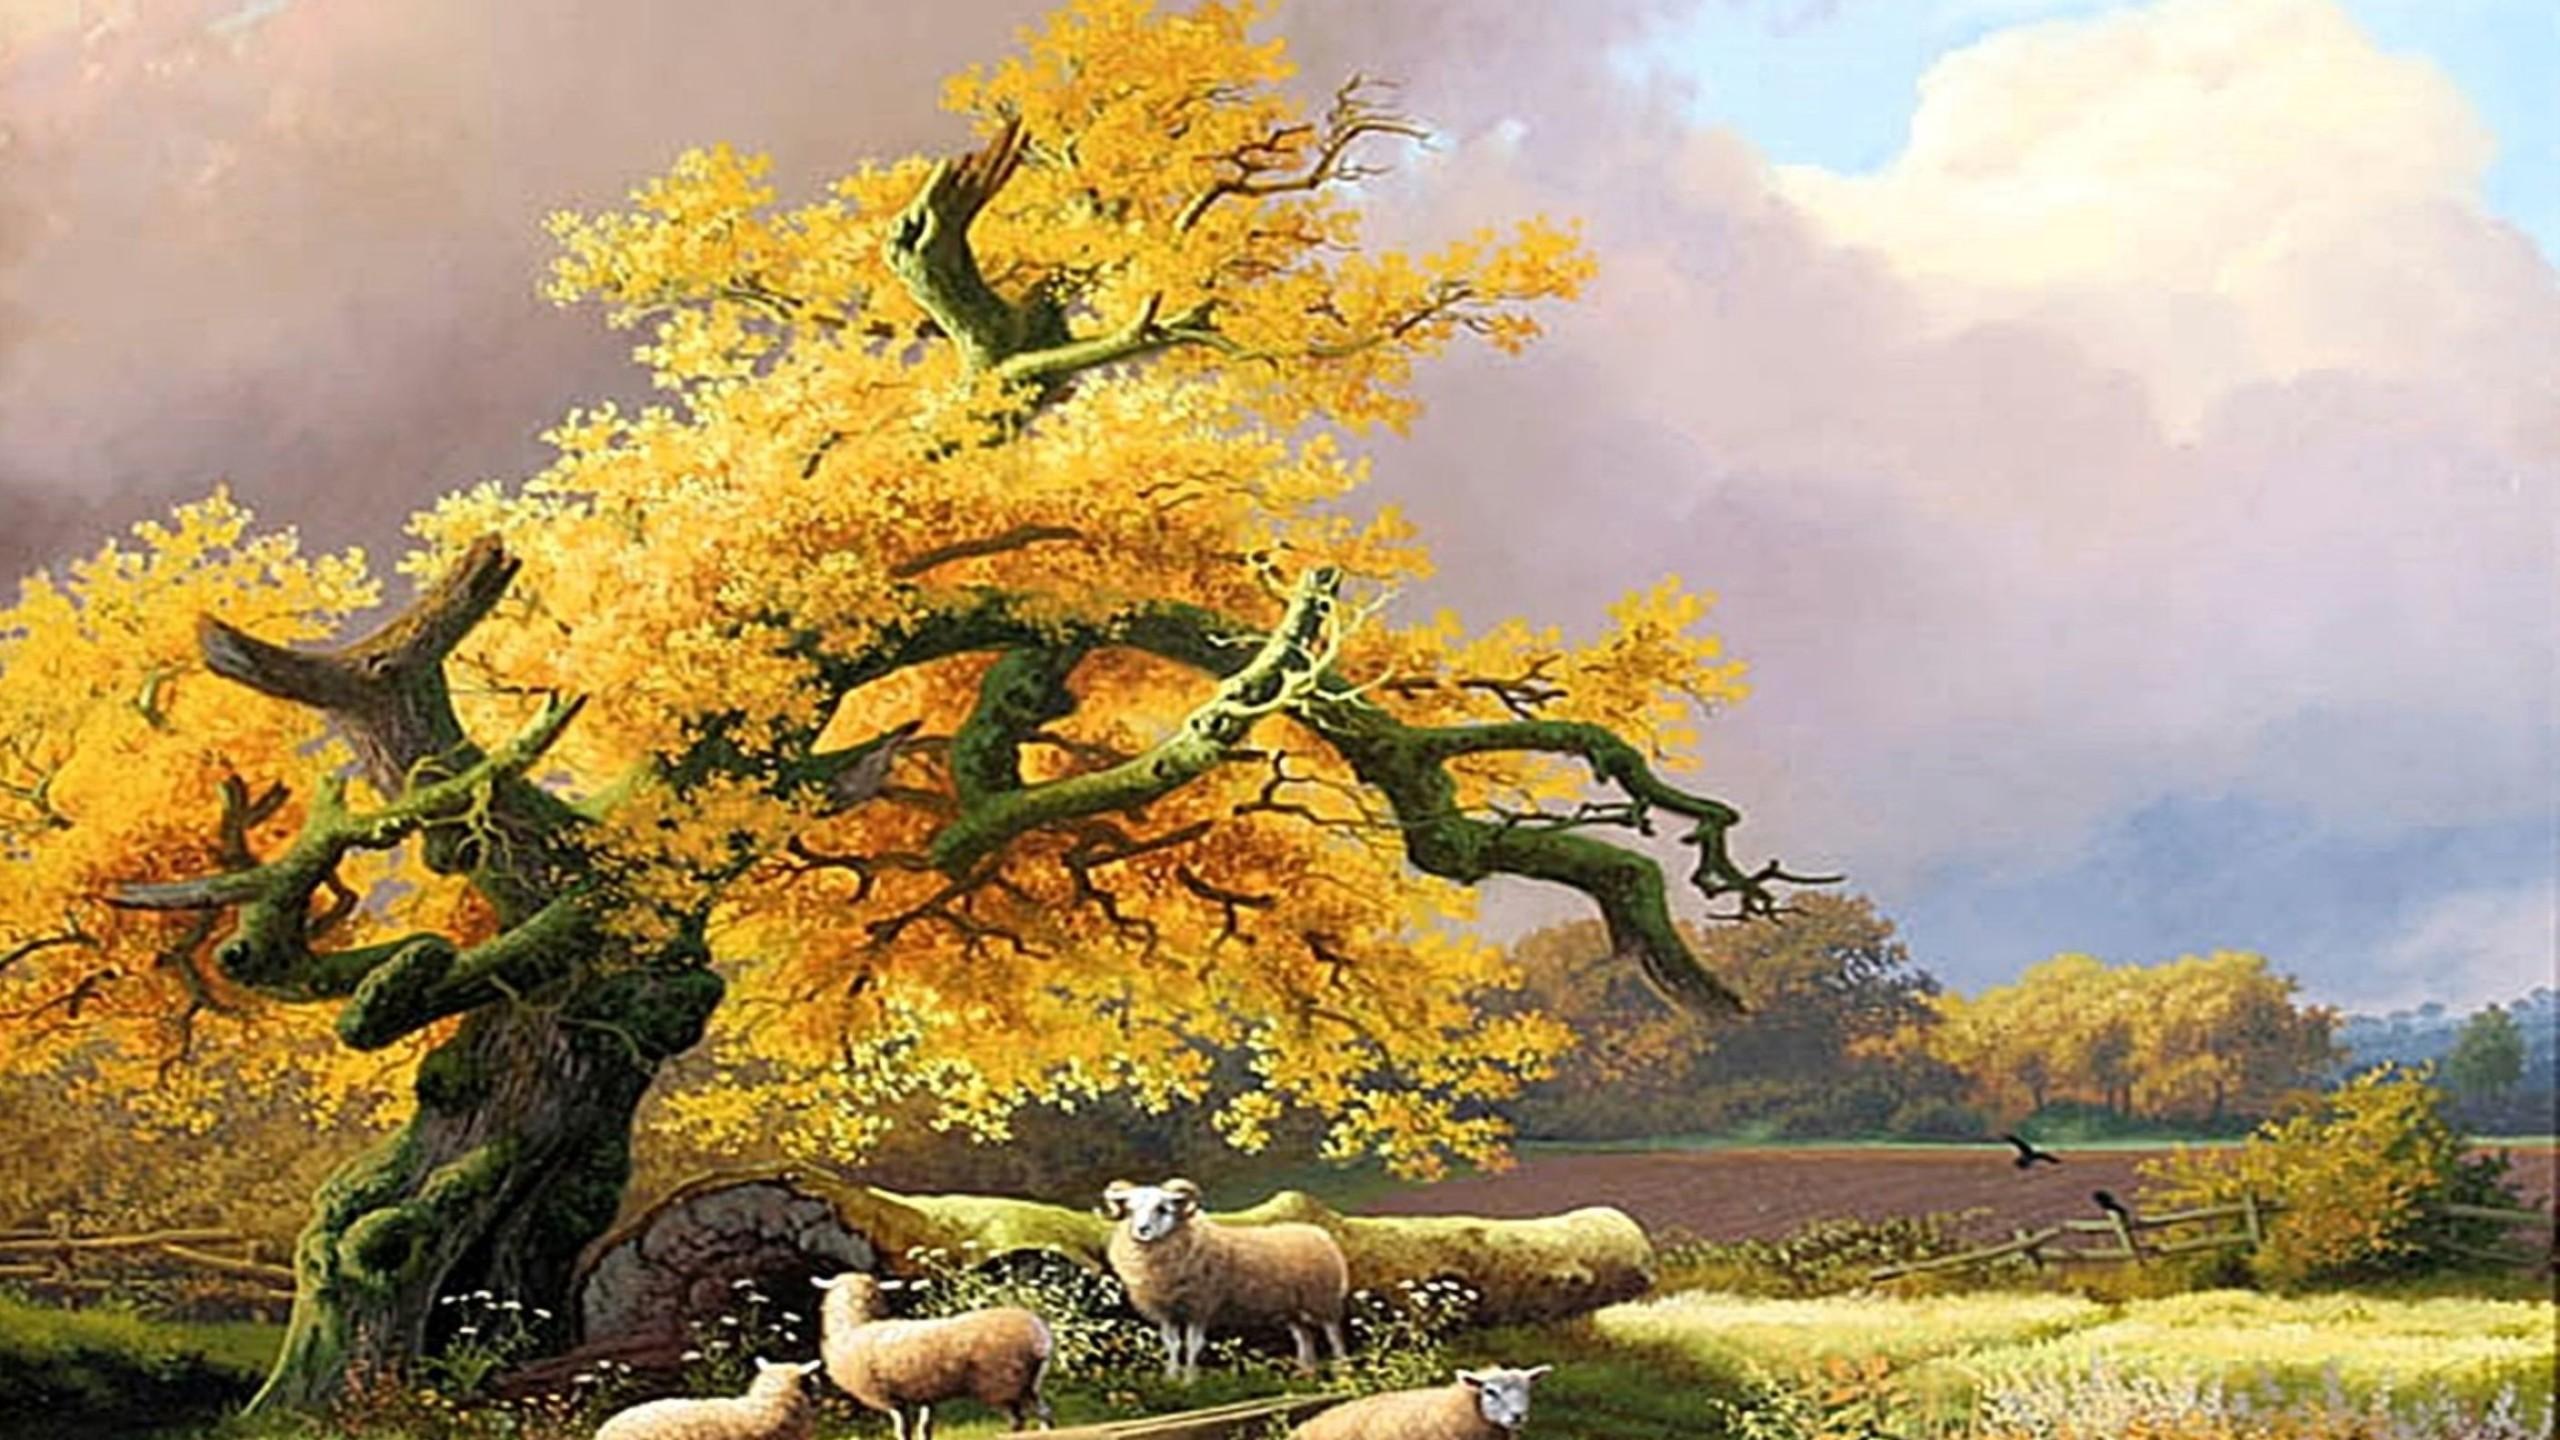 Nature Scene Painting Hd - HD Wallpaper